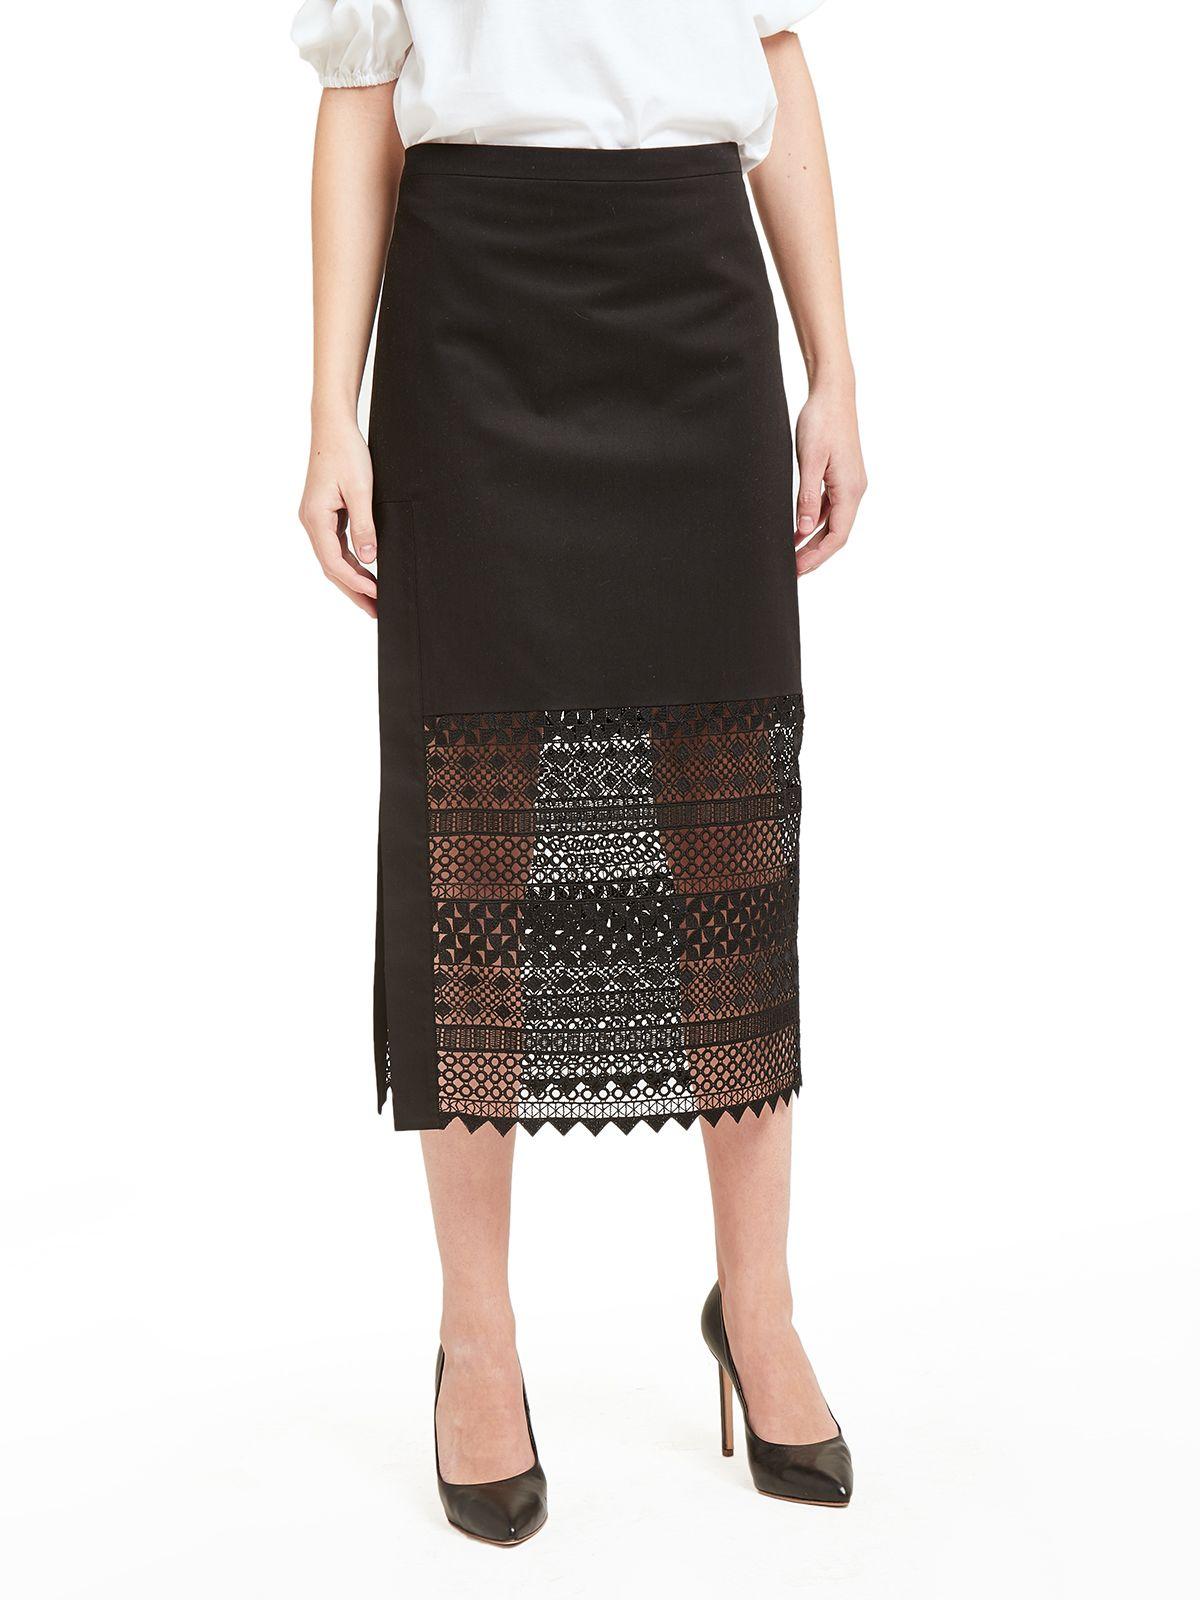 N21 Pencil Skirt